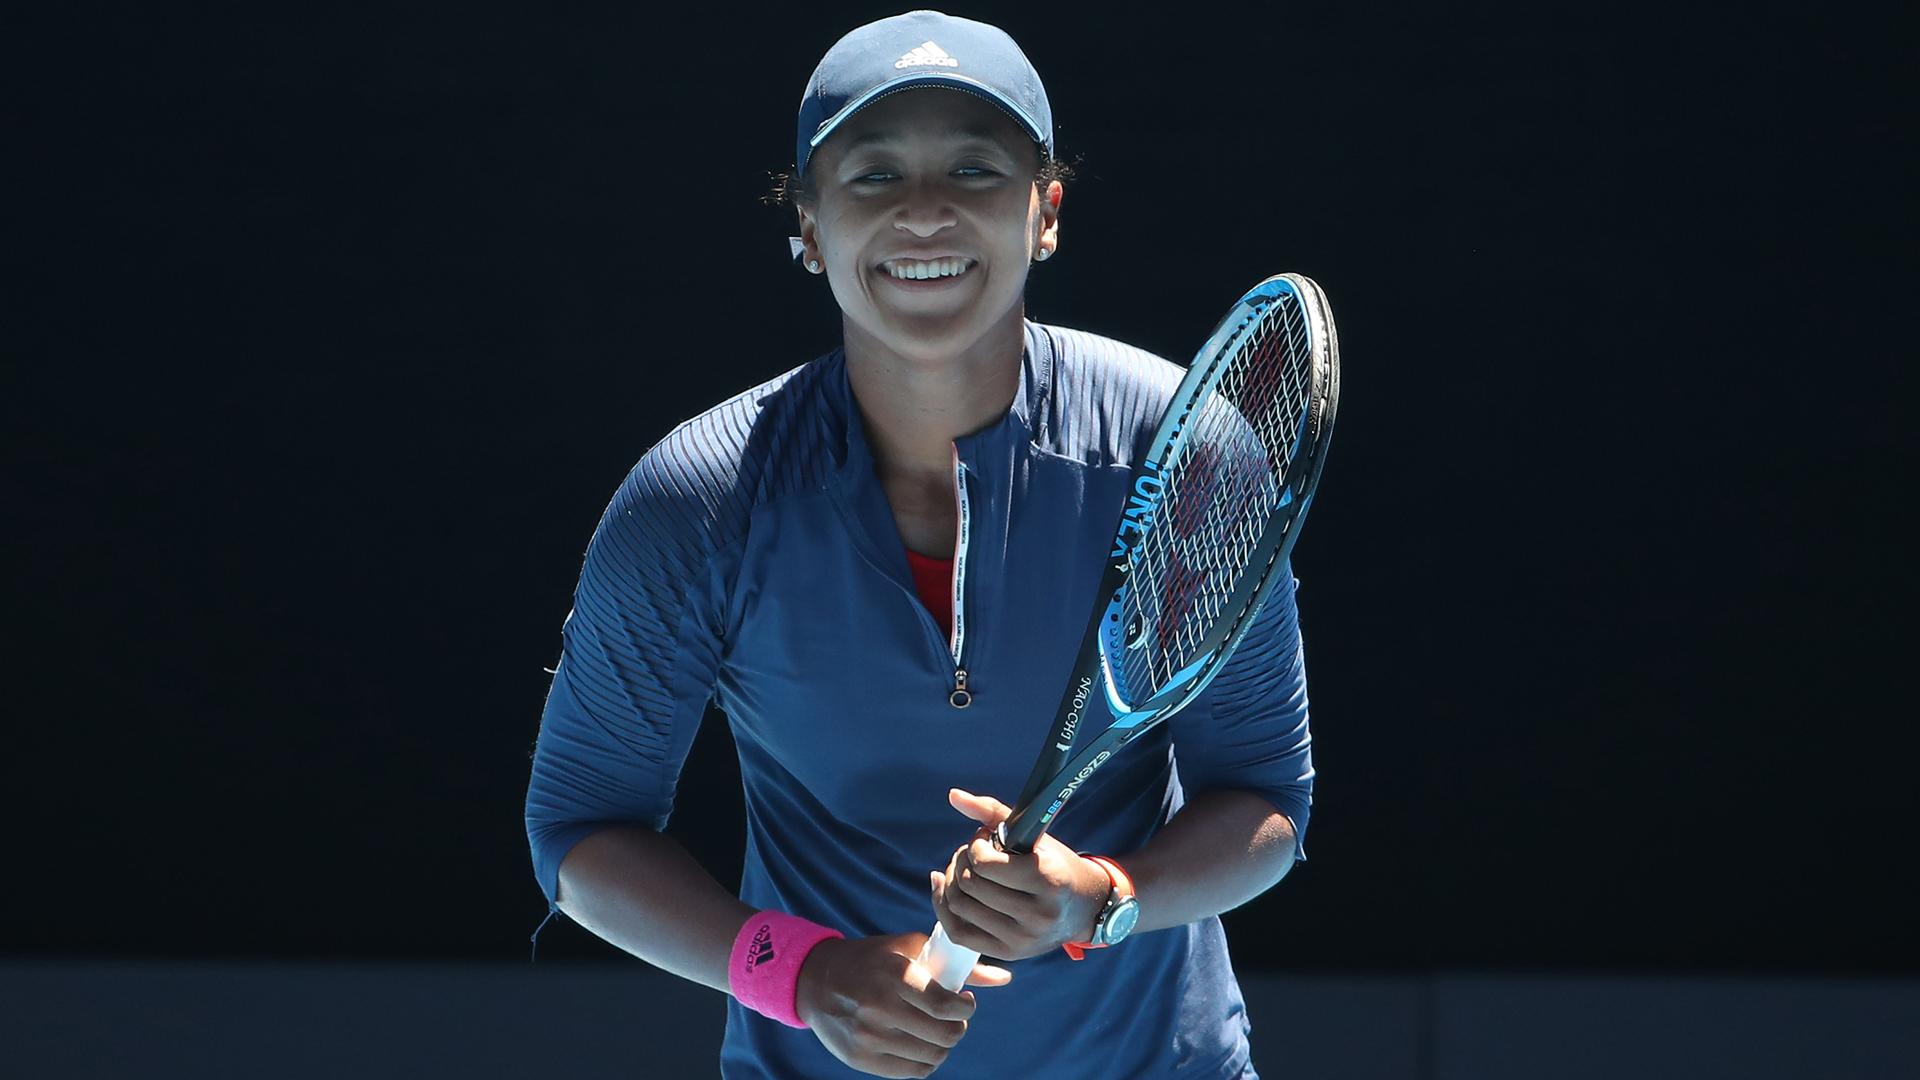 Australian Open 2019: Naomi Osaka not thinking too far ahead